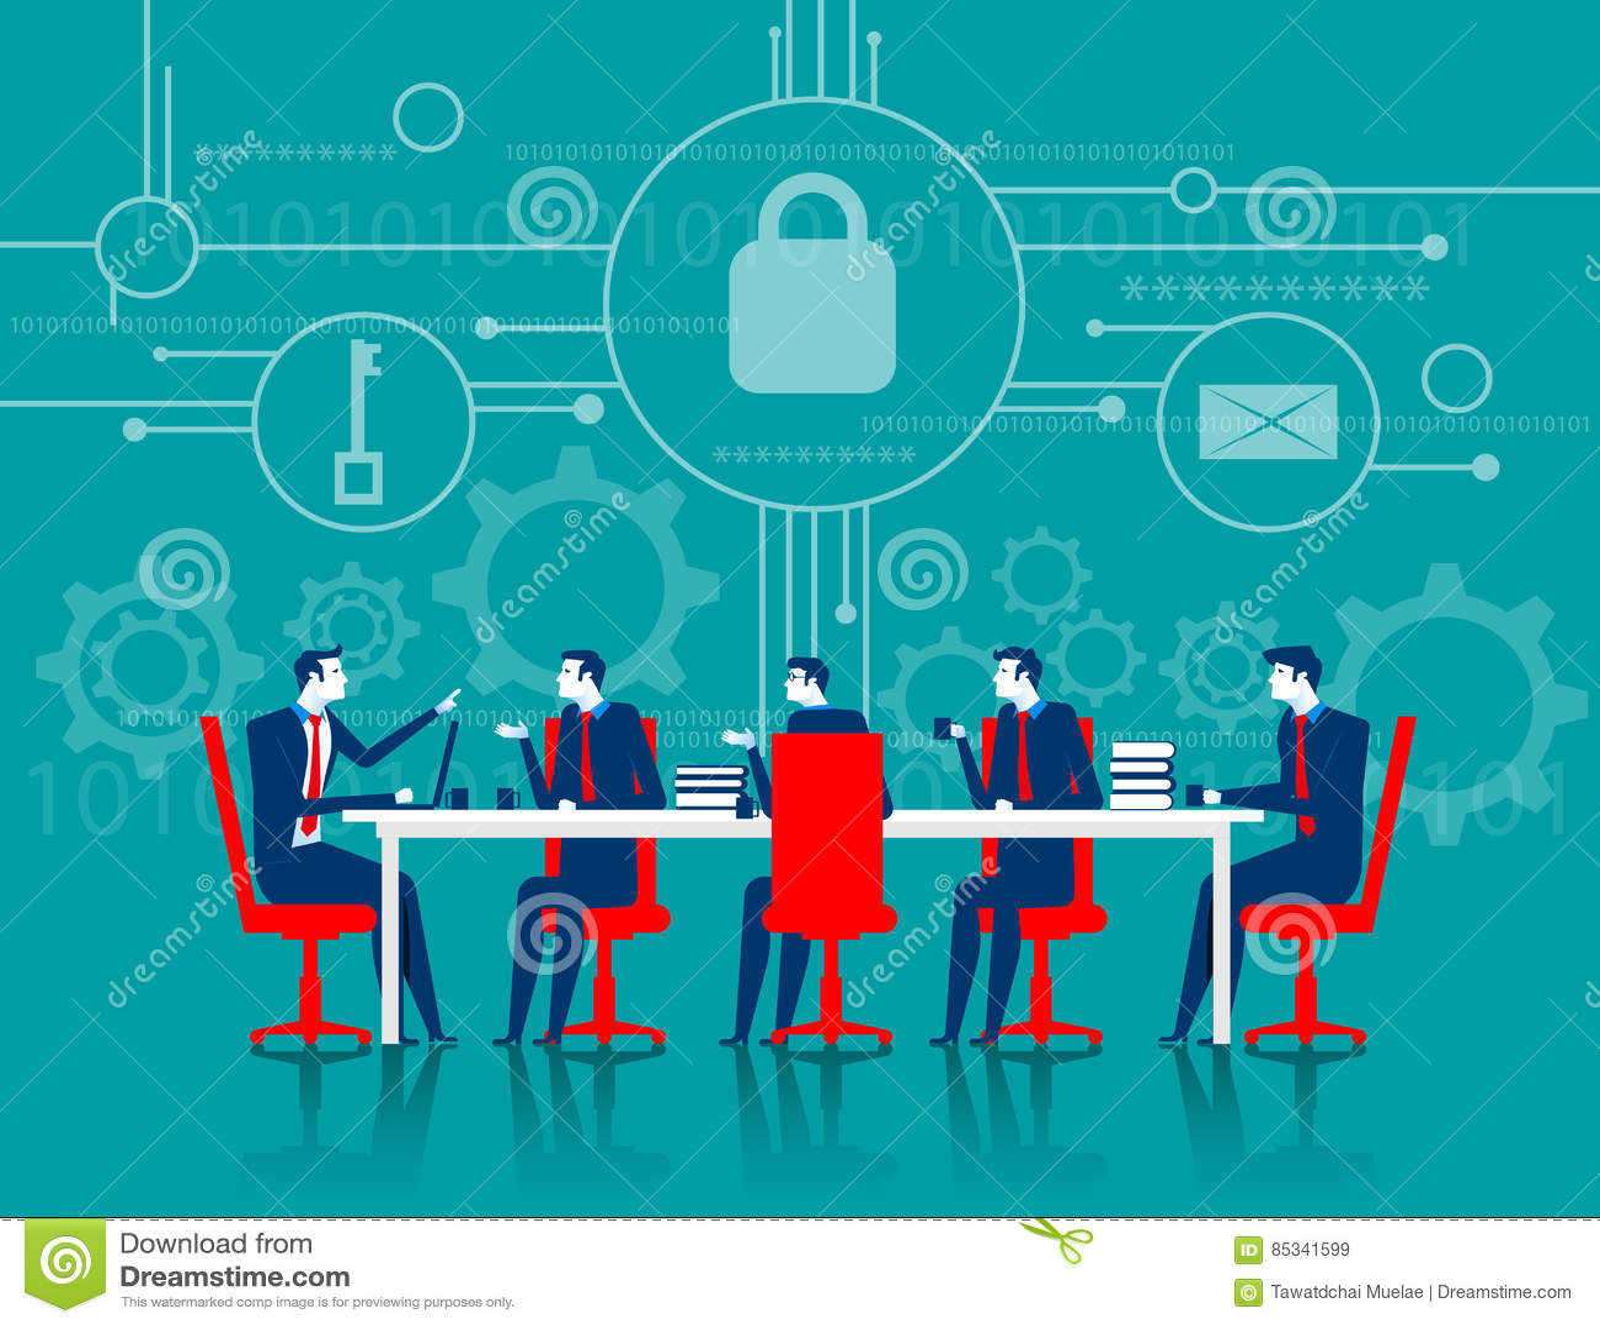 CyberSecurity 业务会议安全